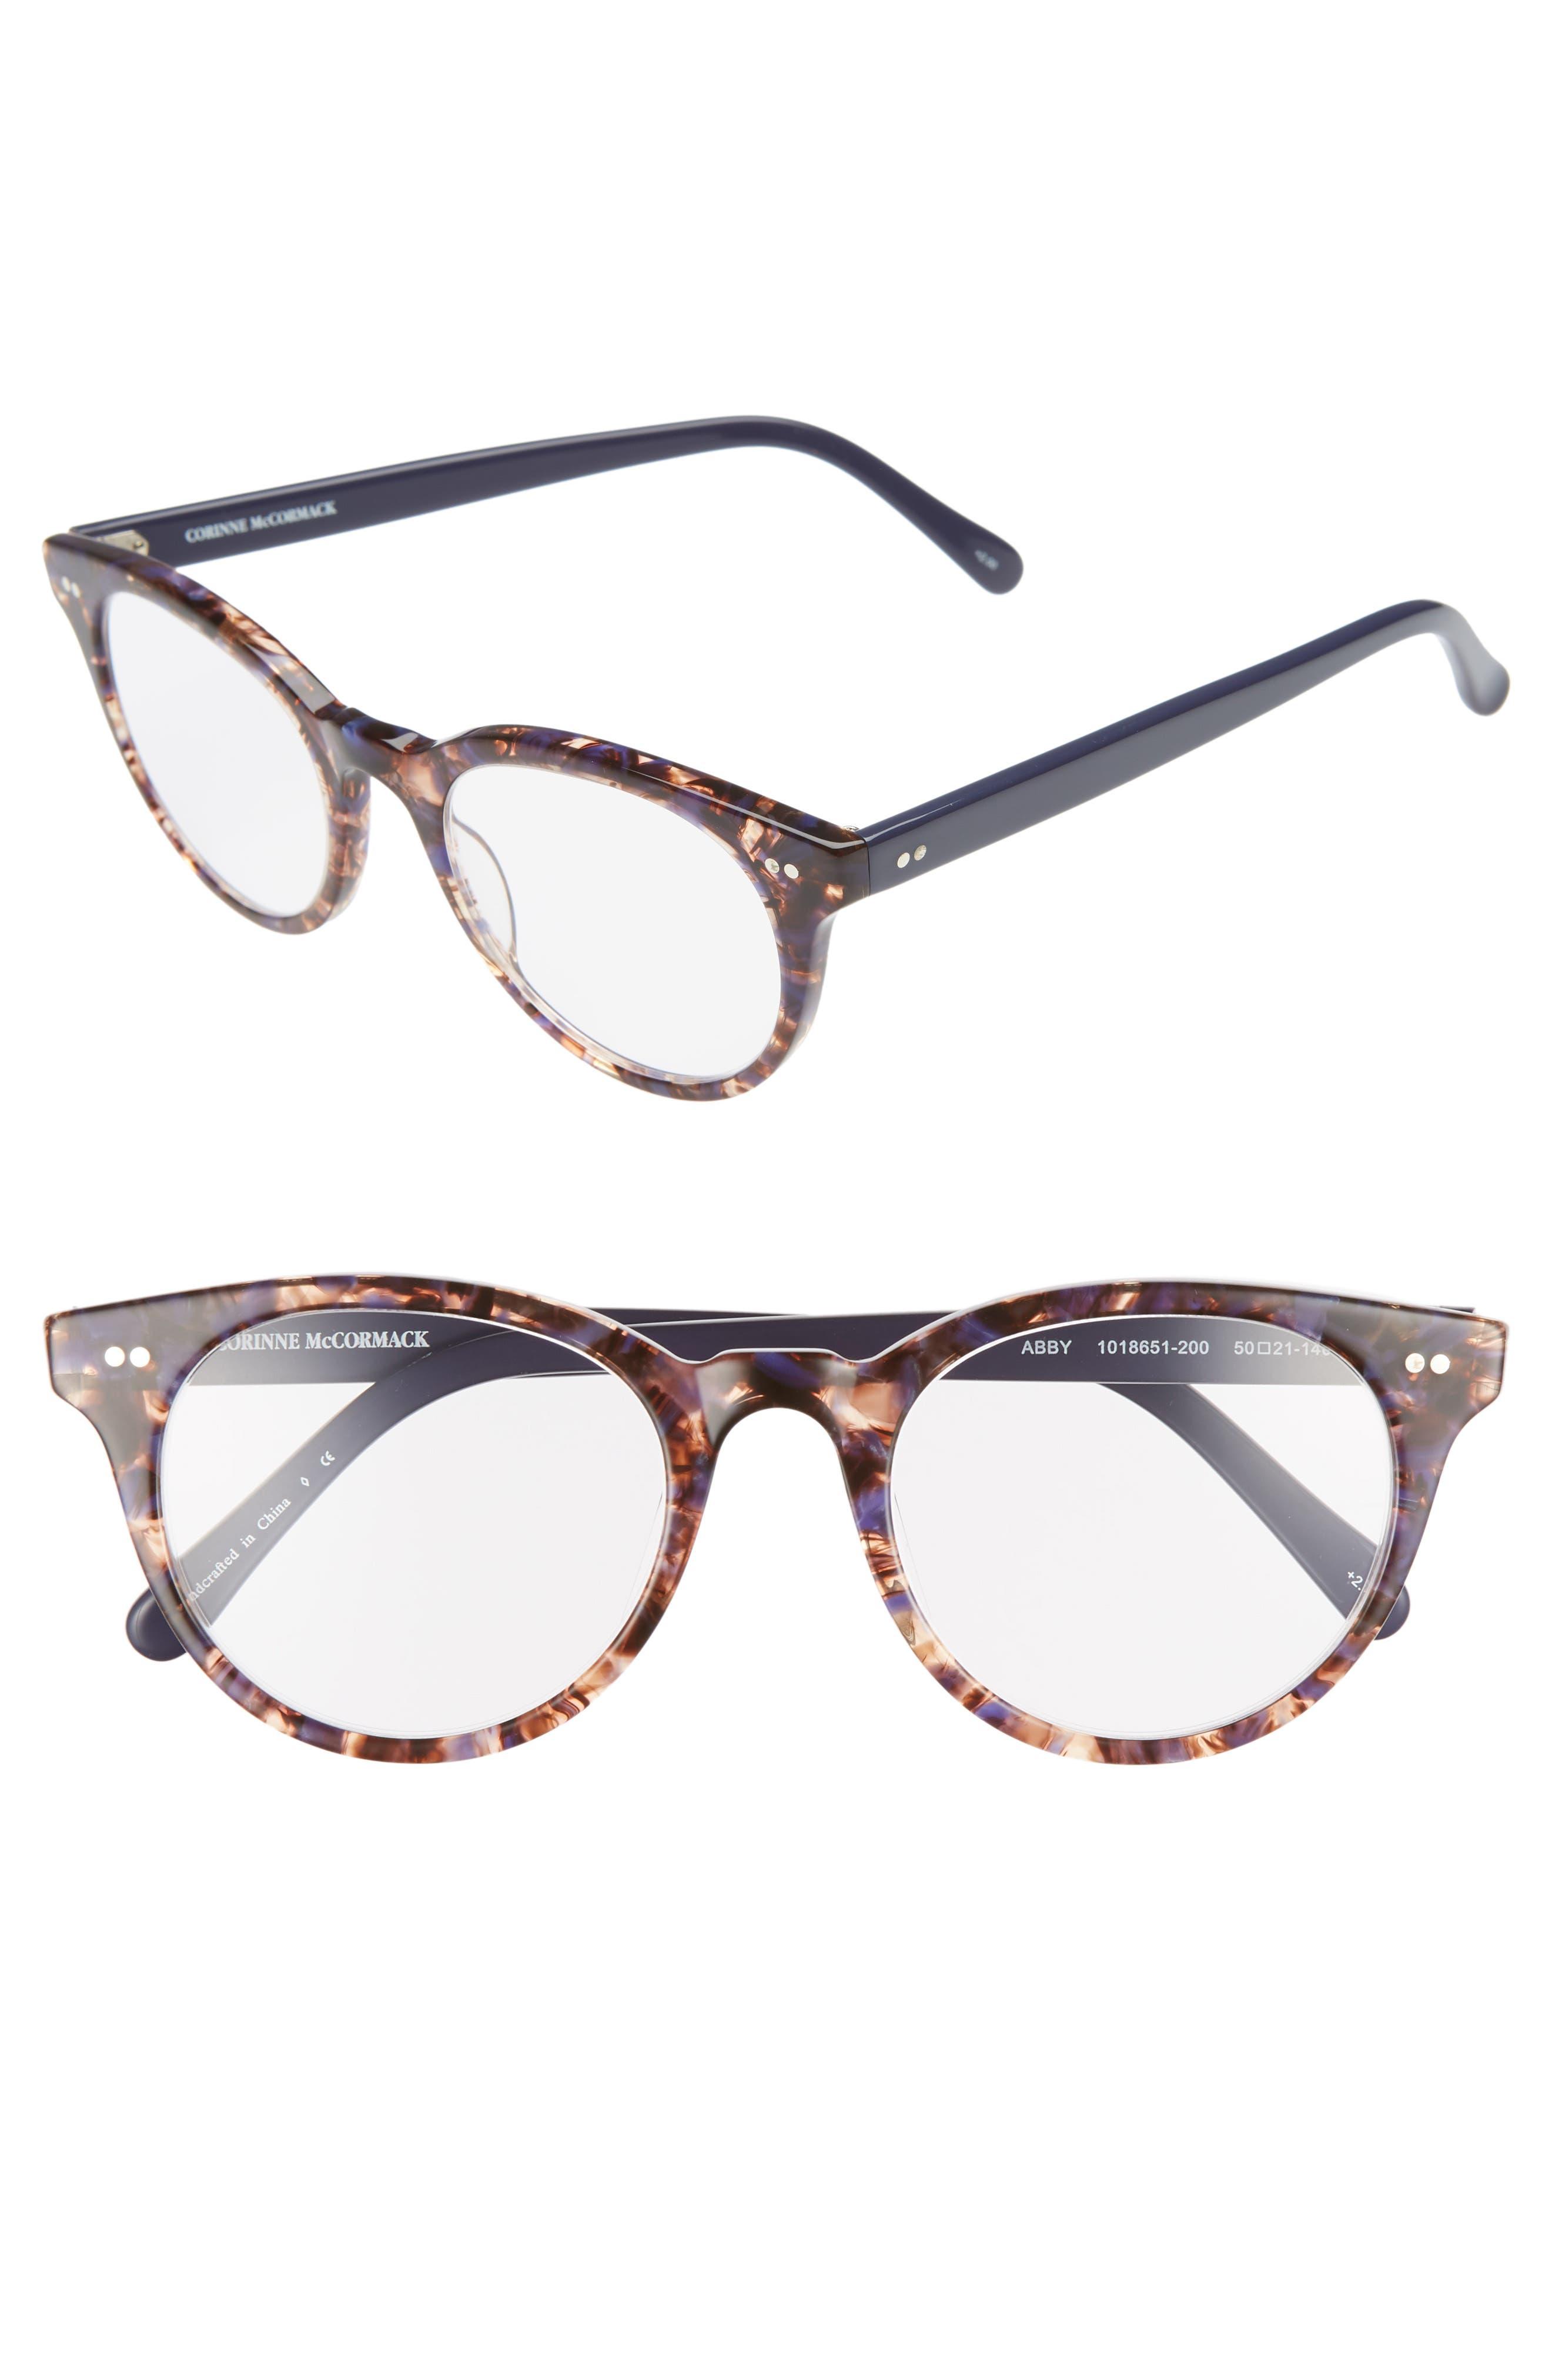 Abby 50mm Reading Glasses,                             Main thumbnail 1, color,                             TORTOISE/ NAVY BLUE